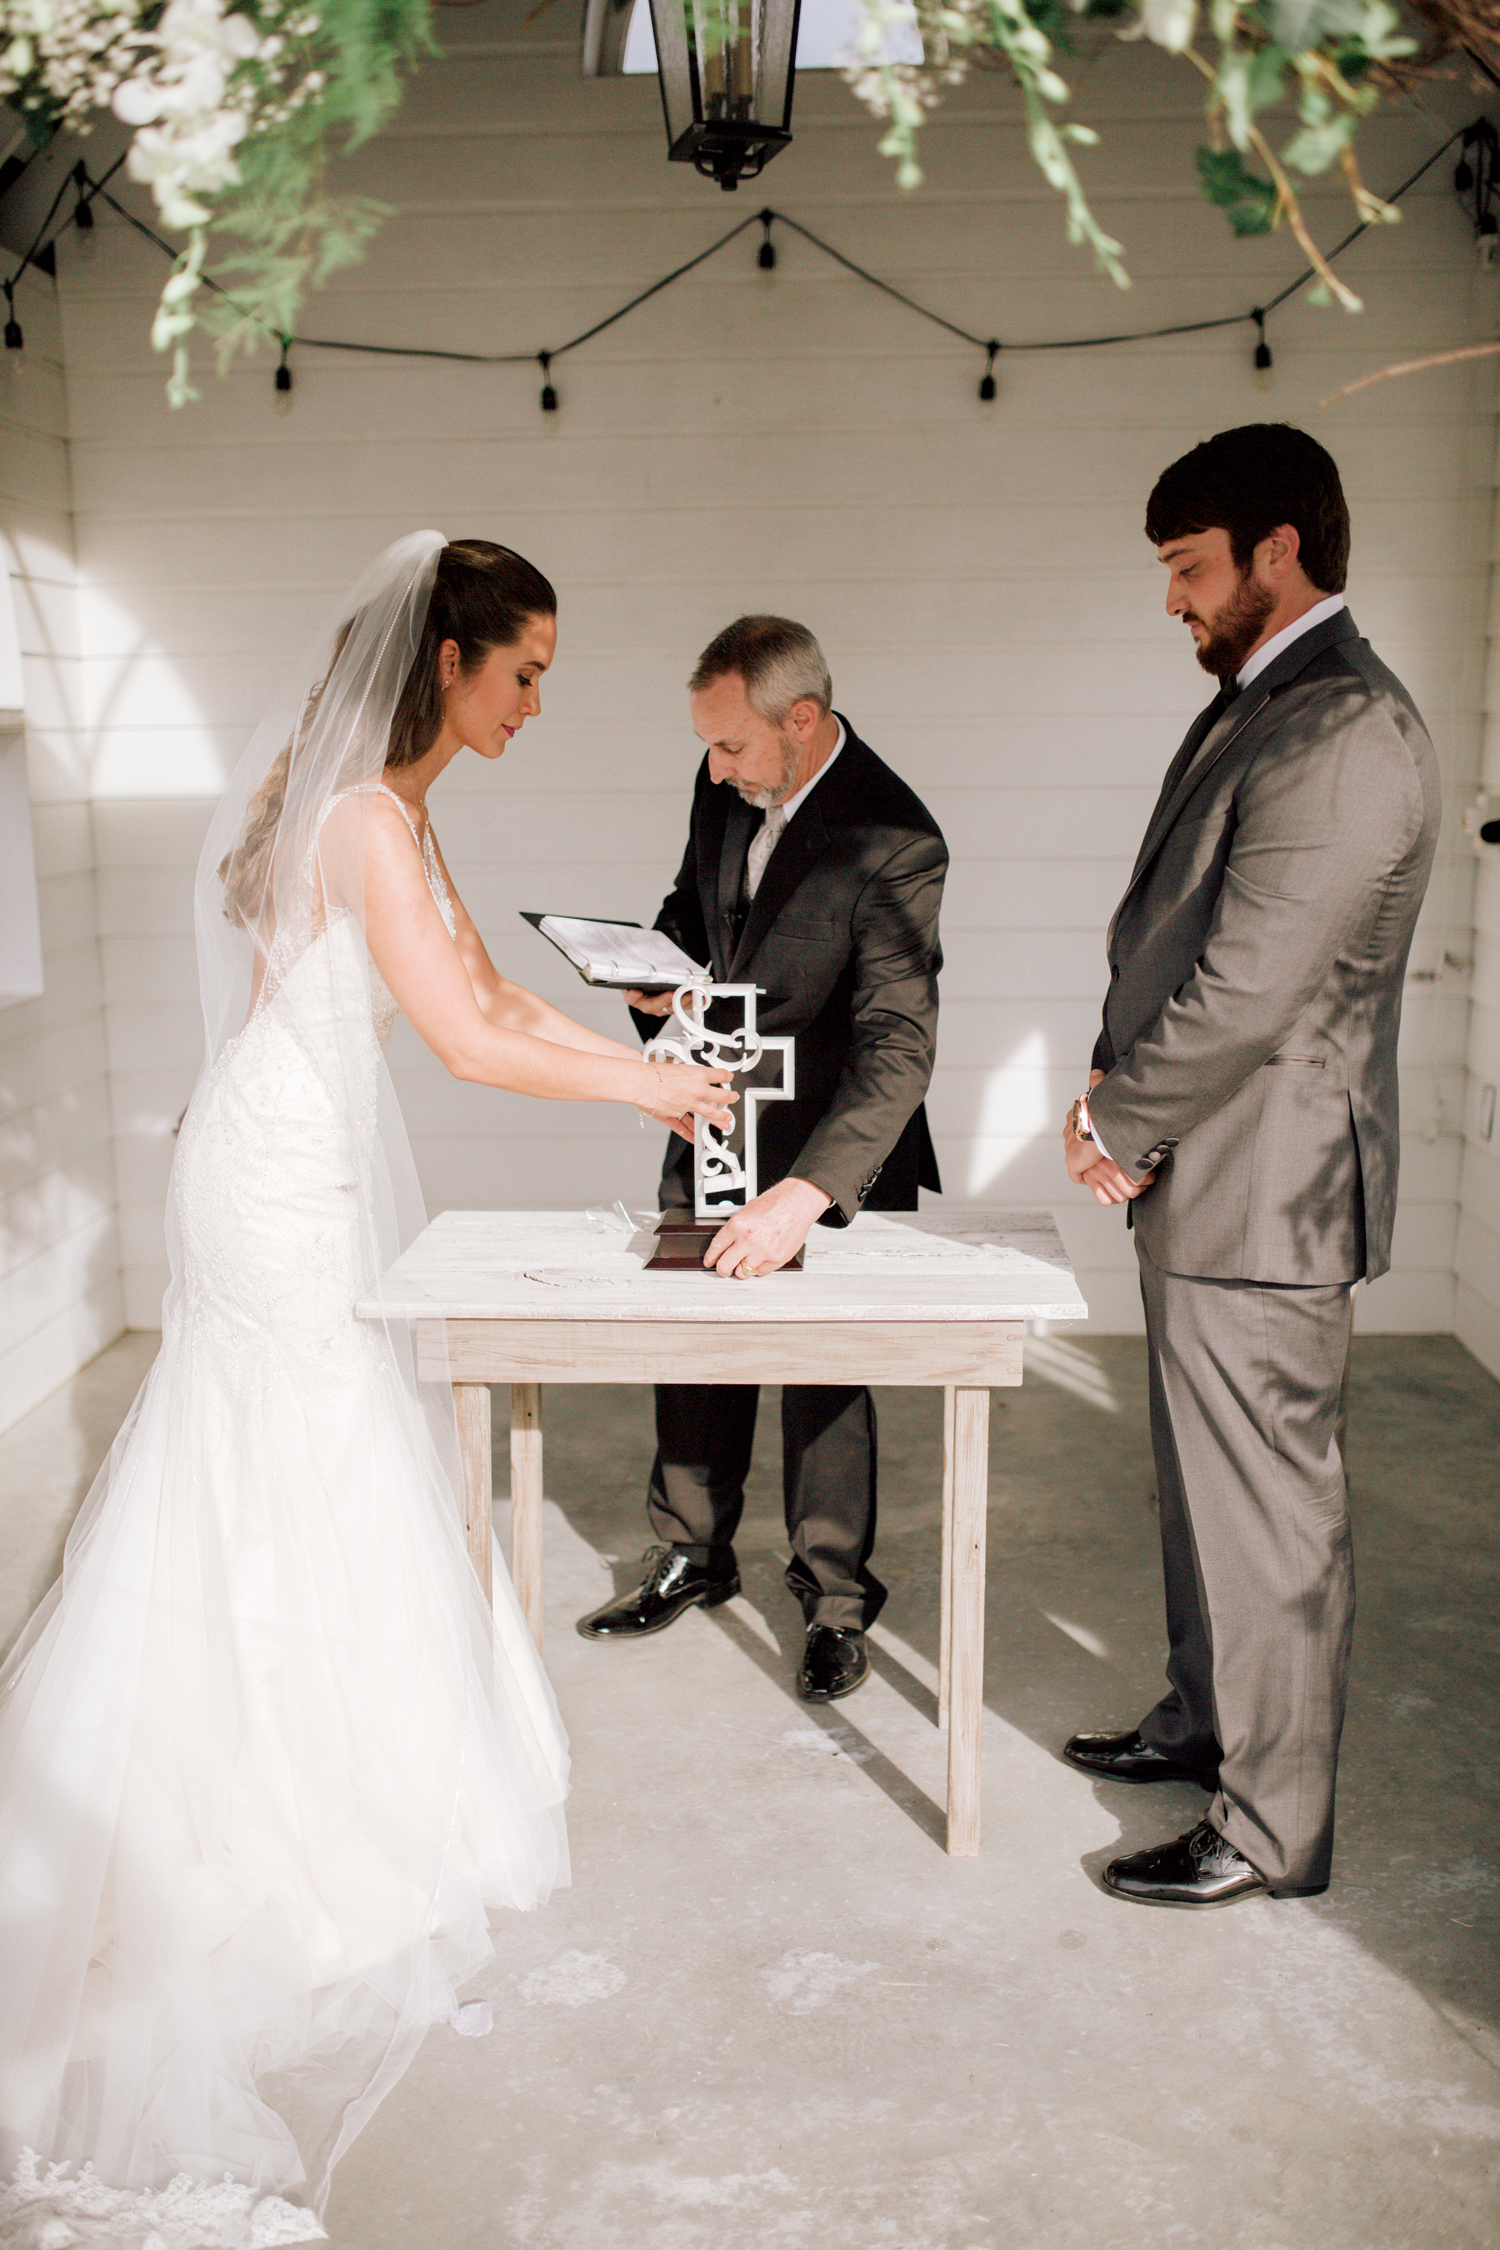 alaa-marzouk-photography-rgvweddingphotographer-rio-grande-valley-mathis-wedding-bridal-bride-san-antonio-portrait-weddings-mcallen-103.jpg